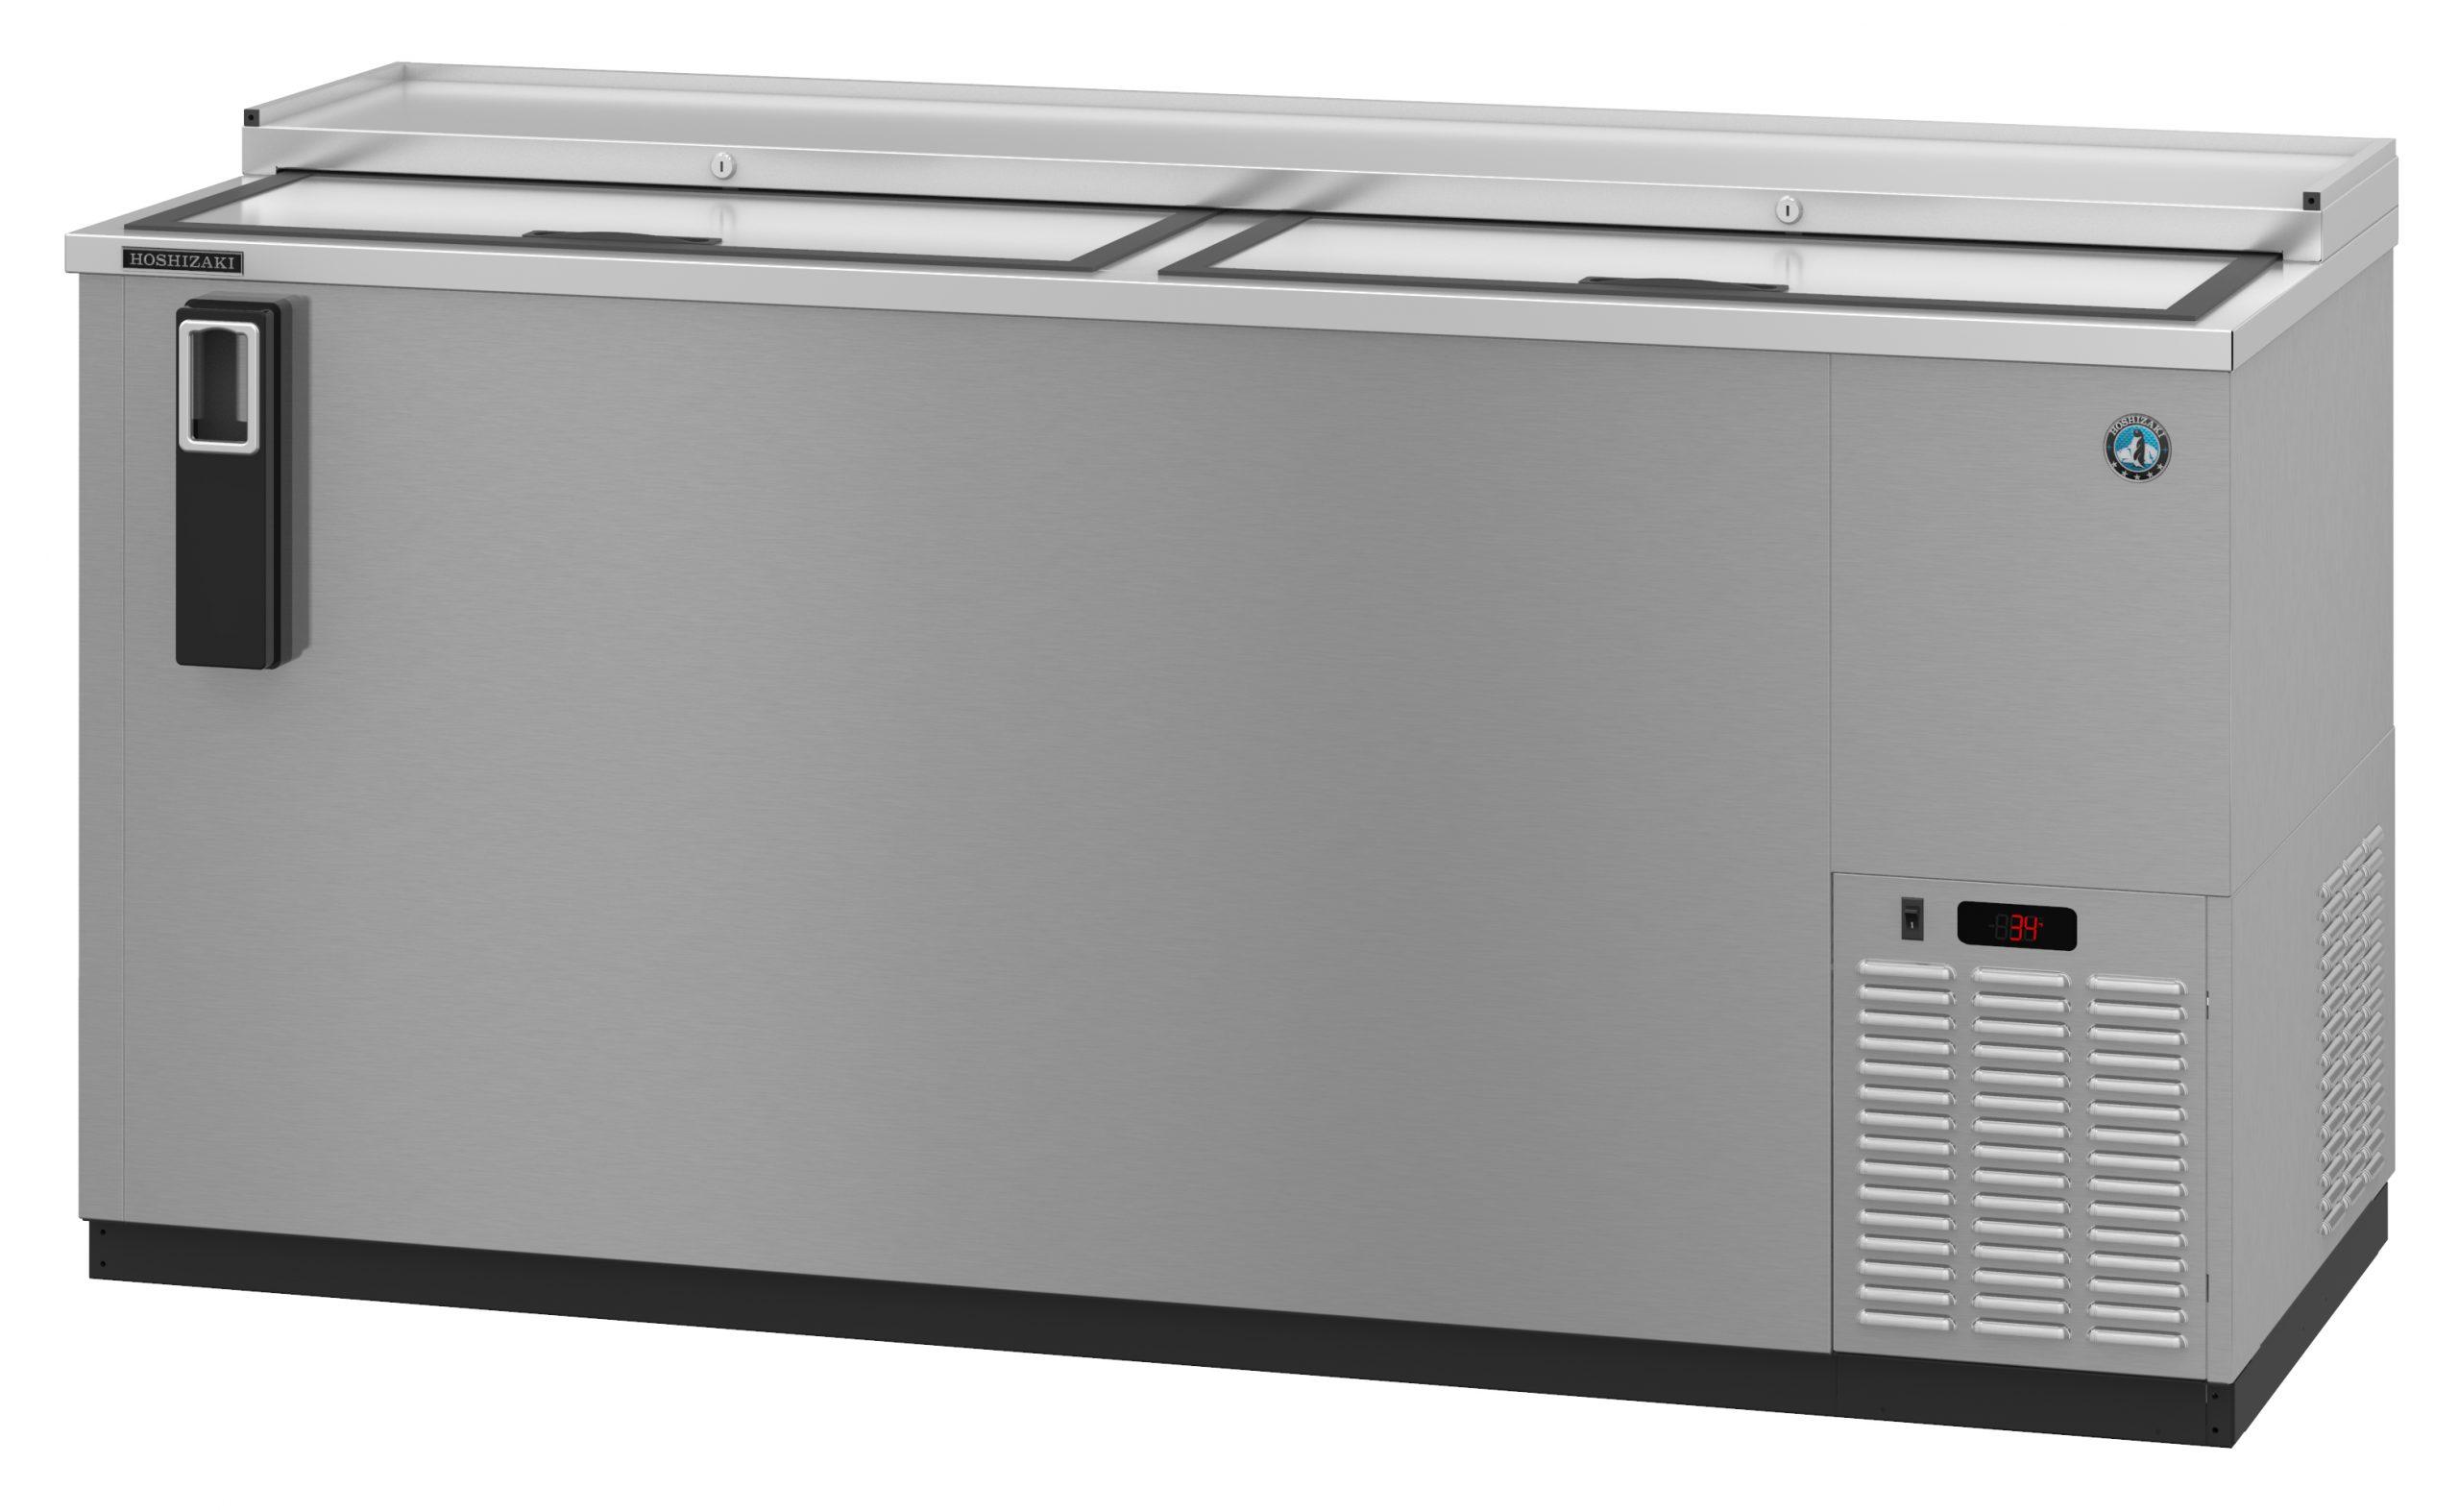 CC65-S